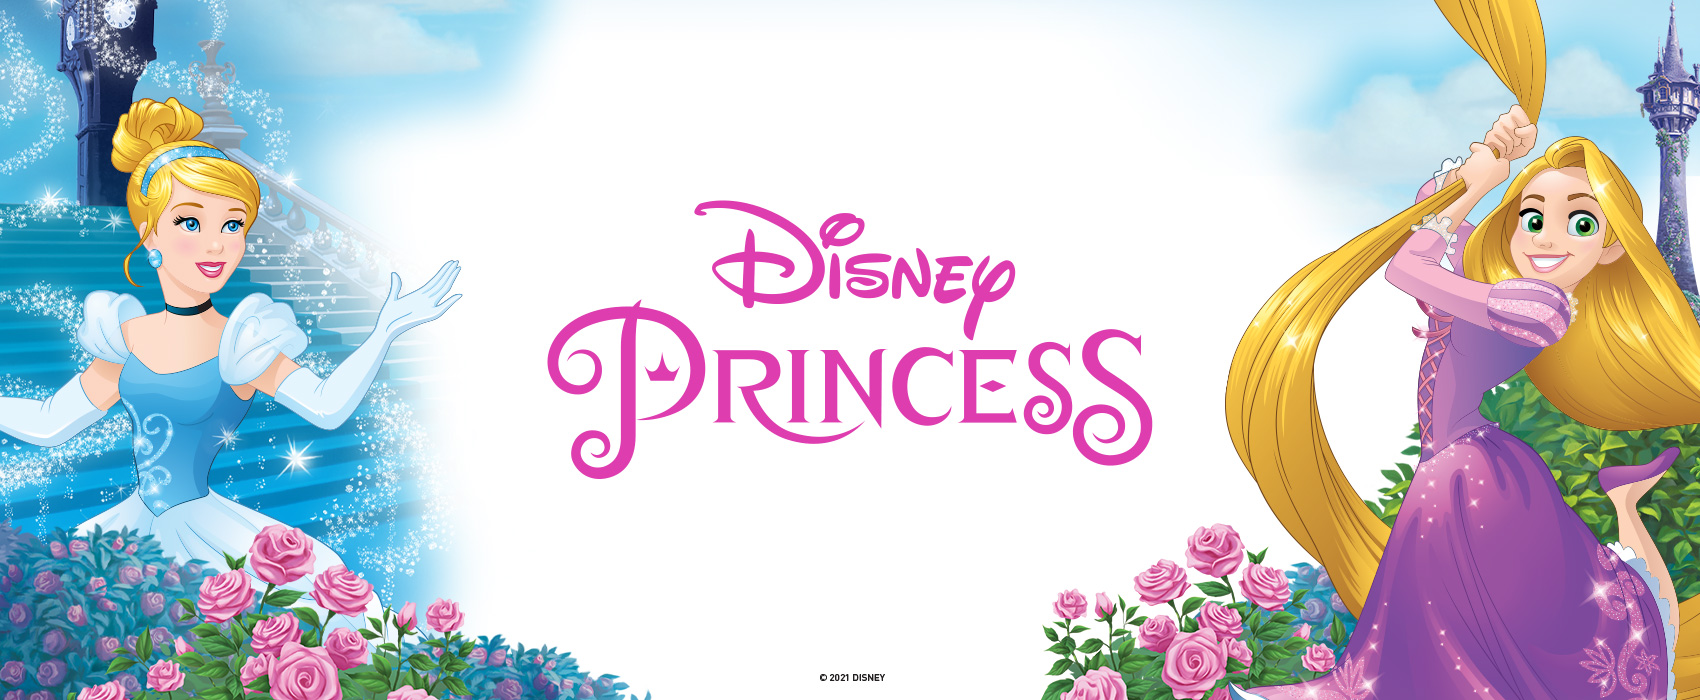 CG2021_Marques_1700x700_DisneyPrincess